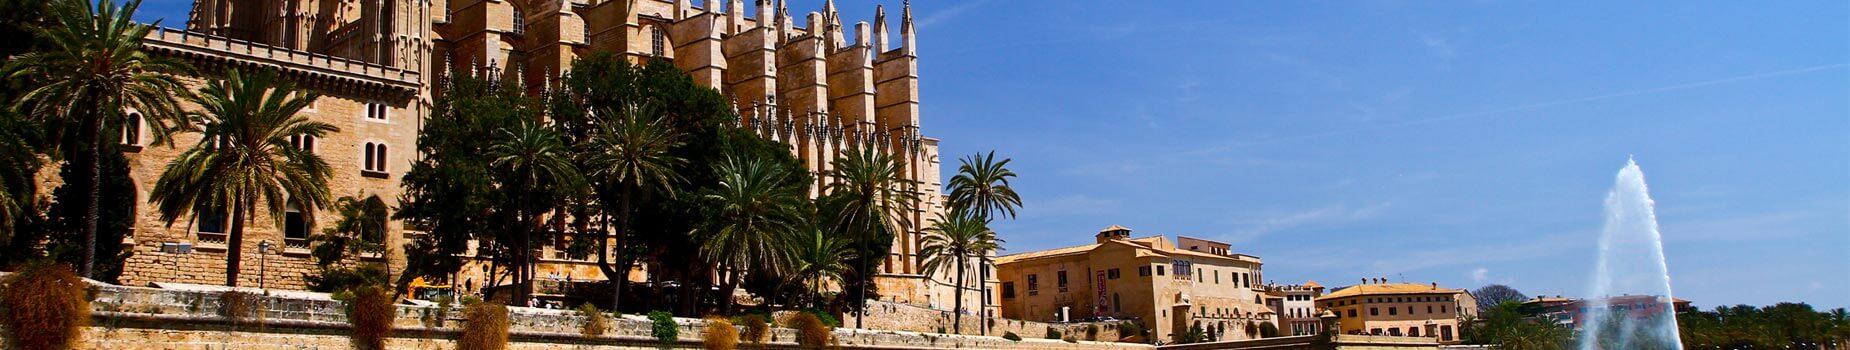 Bezienswaardigheden Mallorca